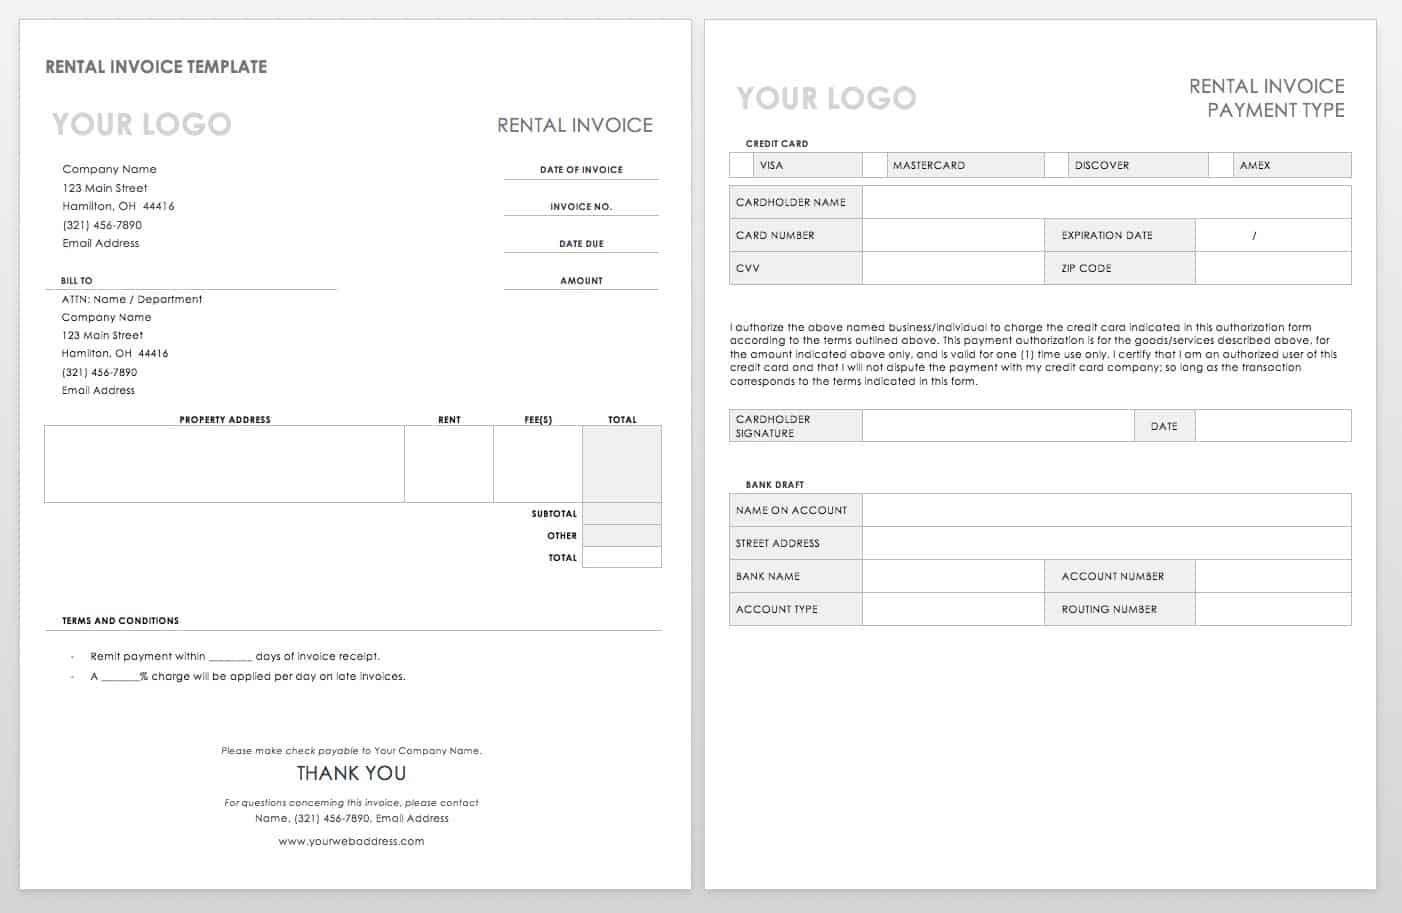 004 Imposing Invoice Template Free Word Concept  Doc Simple UkFull